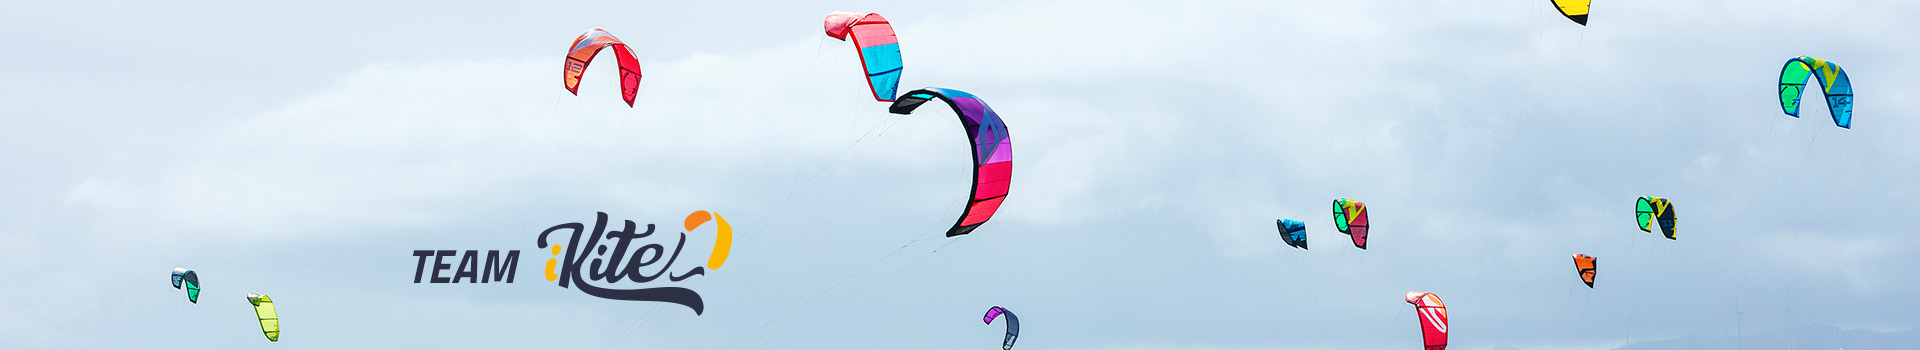 indywidualne lekcje kitesurfingu Hel